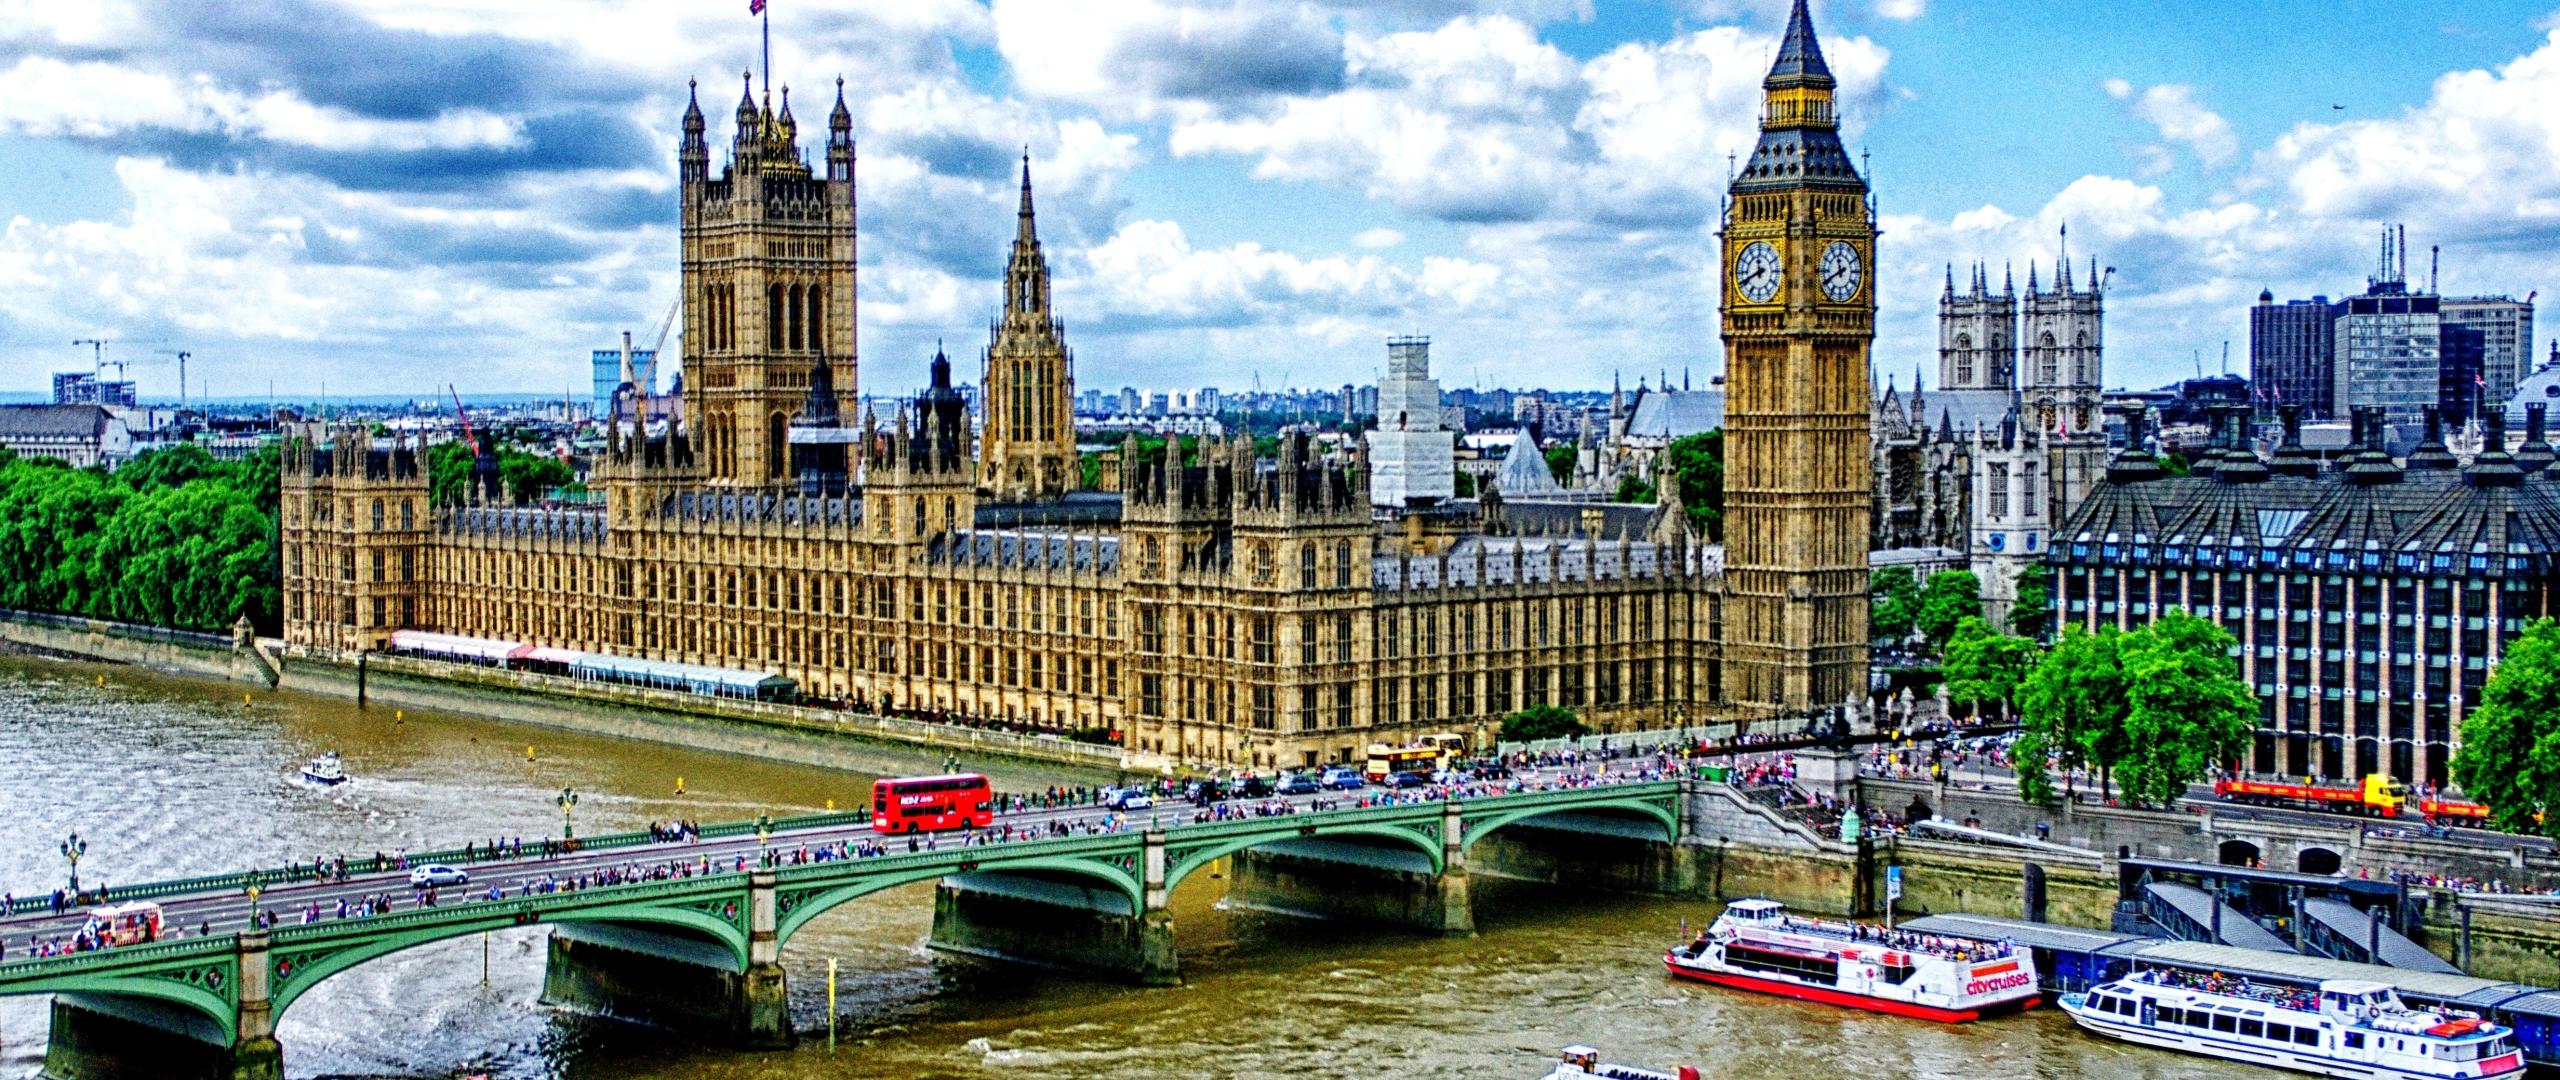 Big Ben, London, Palace Of Westminster, HD 4K Wallpaper